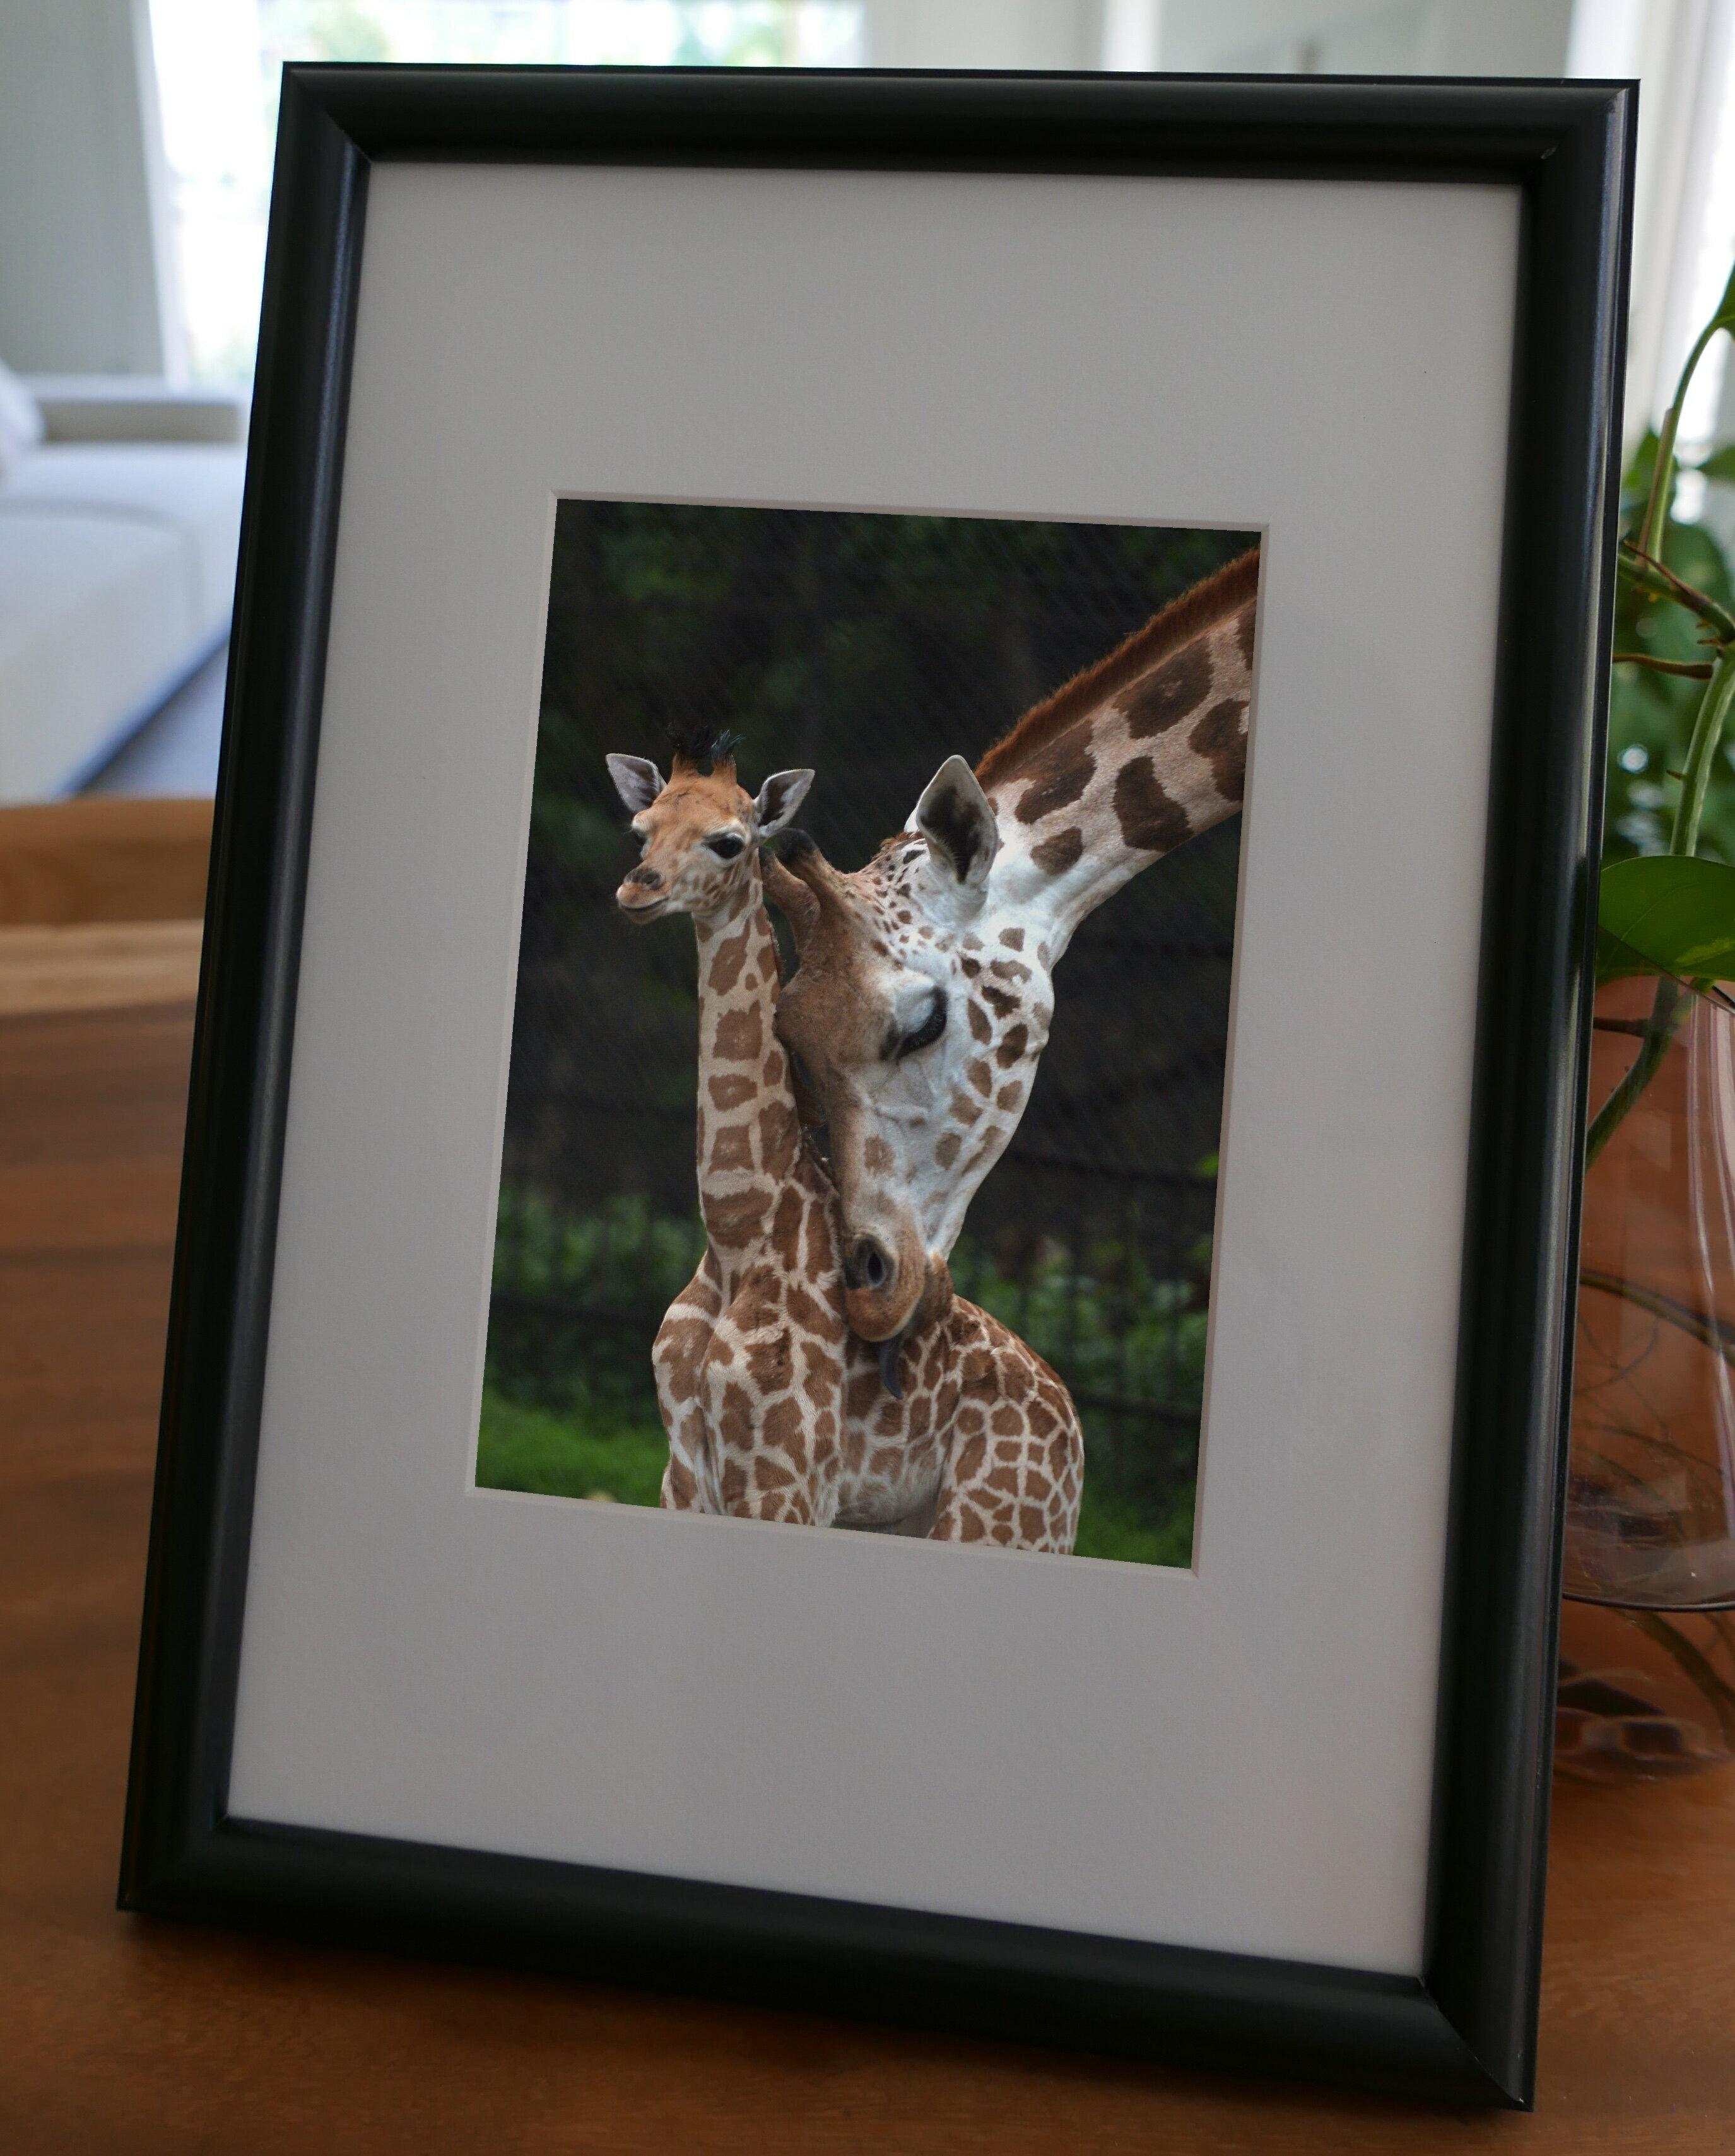 聚鯨Cetacea﹡Art【KLFZ-0919】family love親情/animal動物/warm溫馨 畫框相框